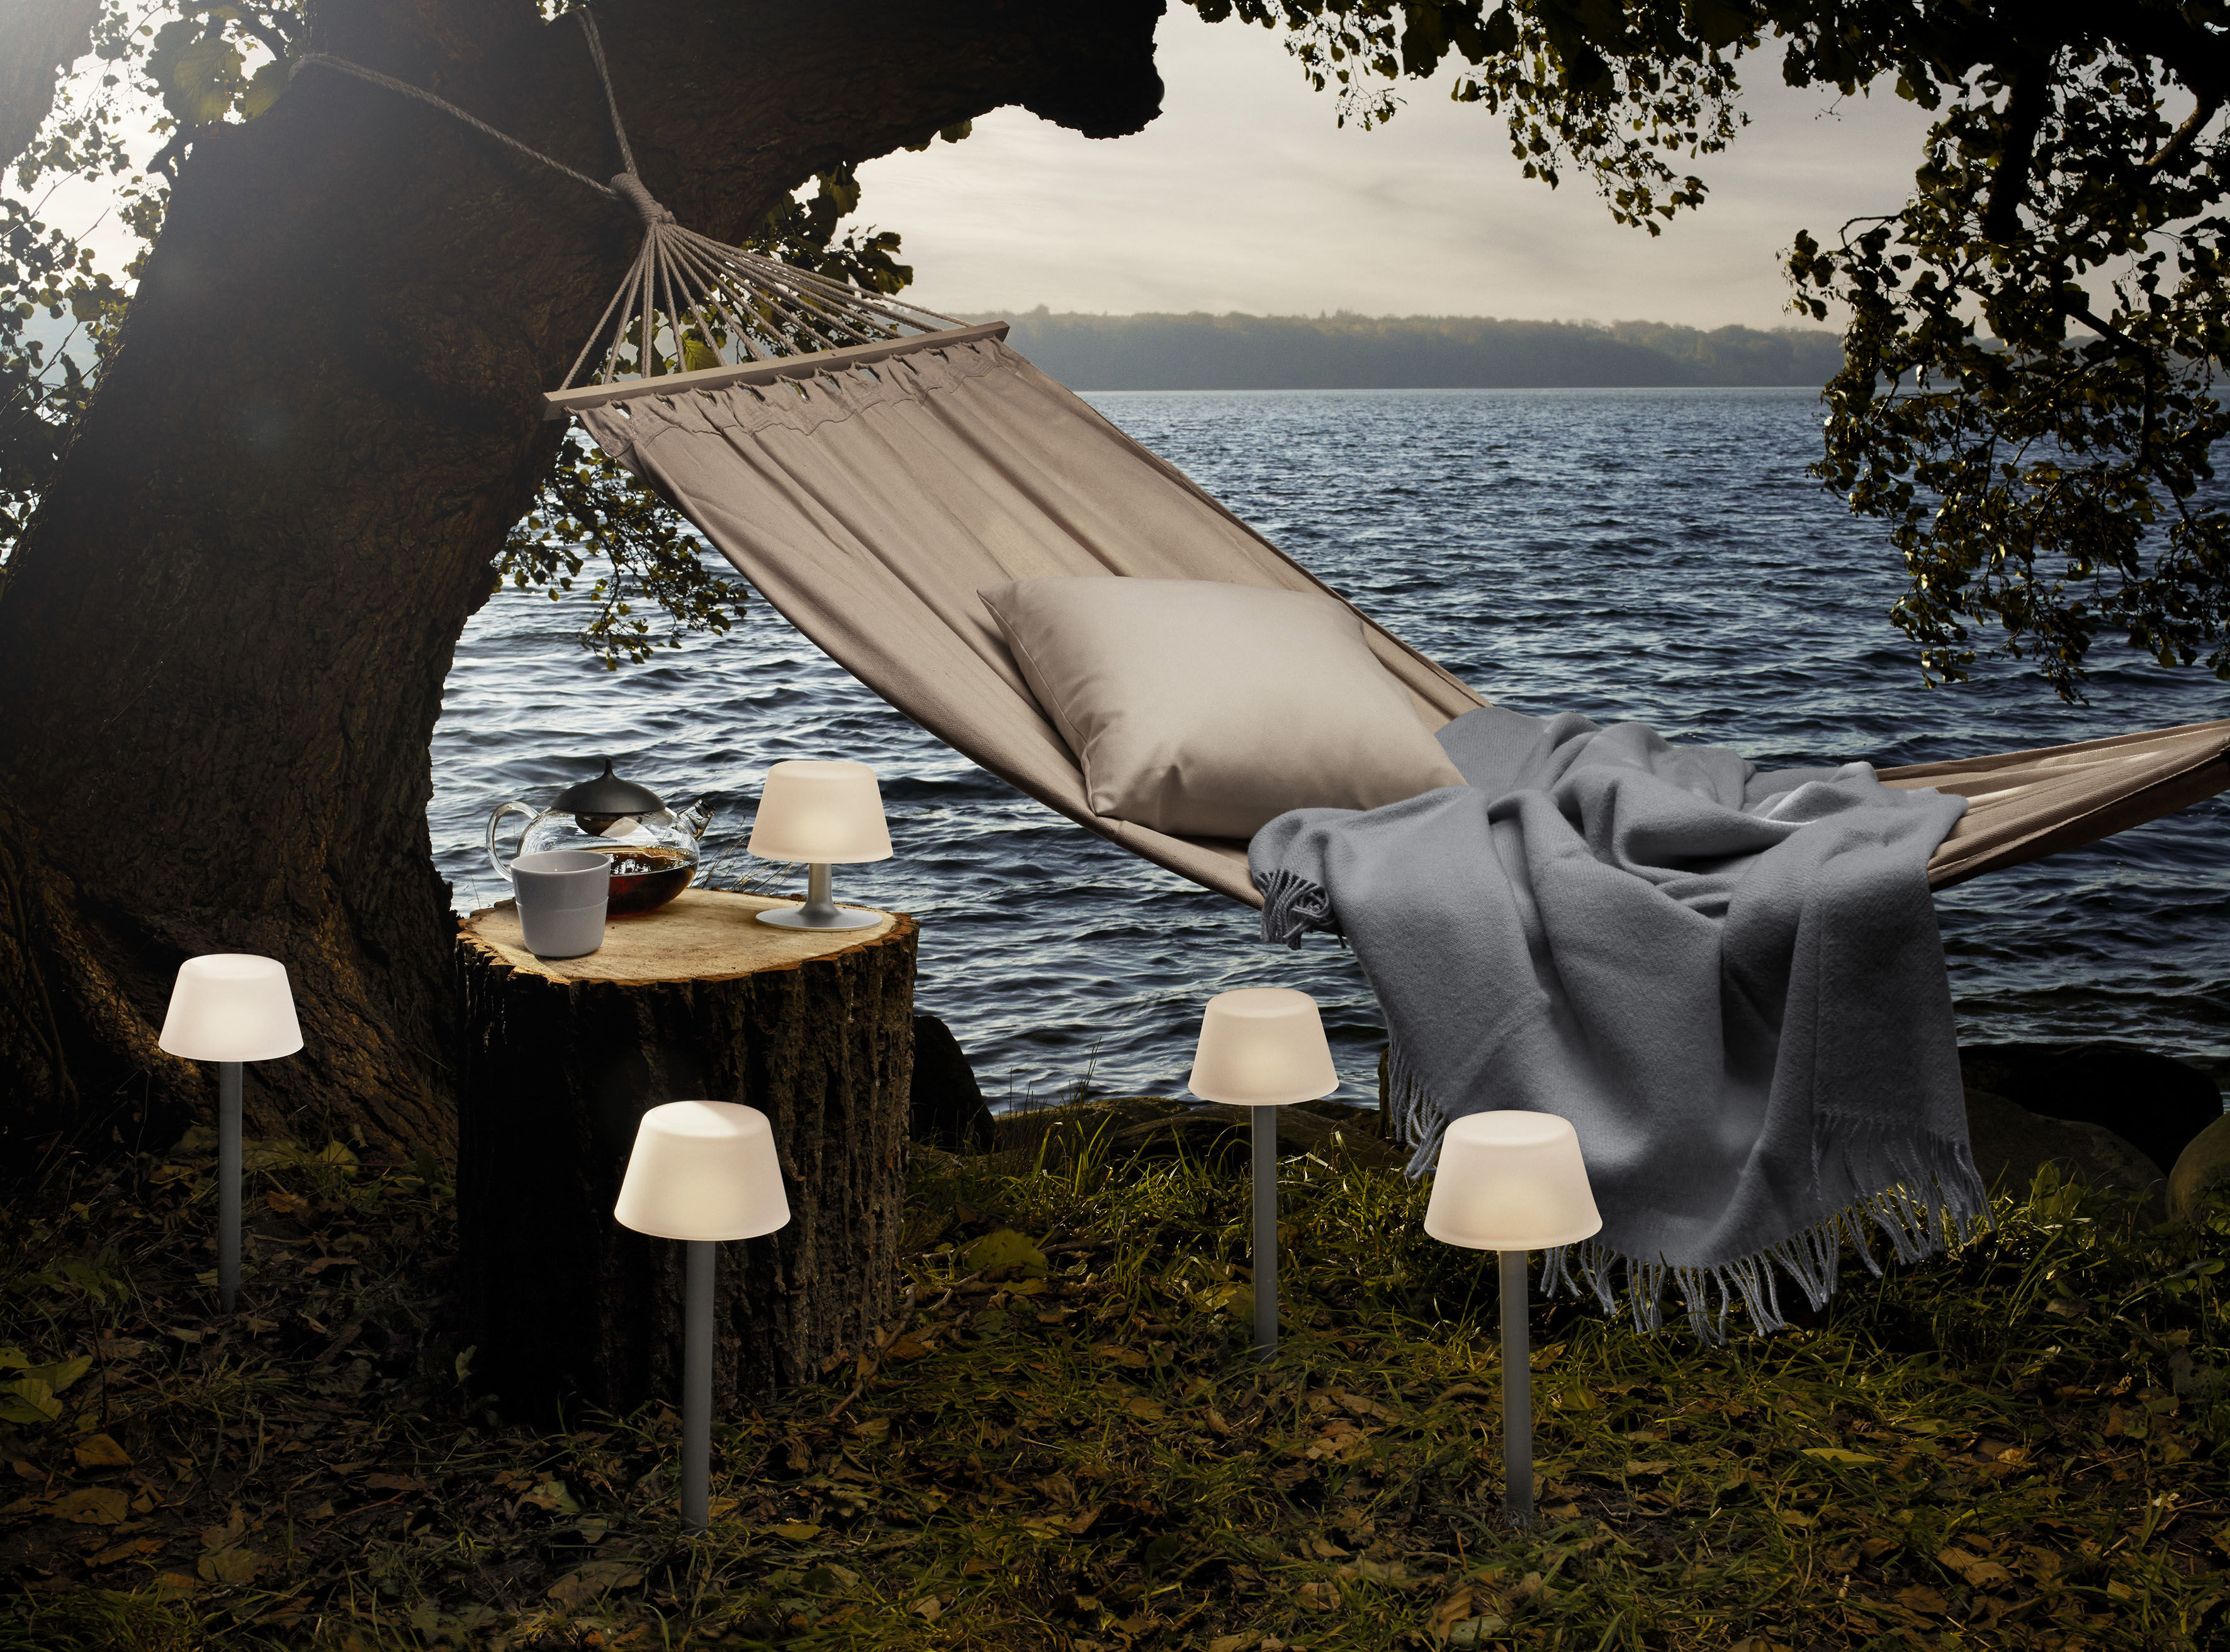 sunlight solarbetrieb kabellos eva solo tischleuchte. Black Bedroom Furniture Sets. Home Design Ideas